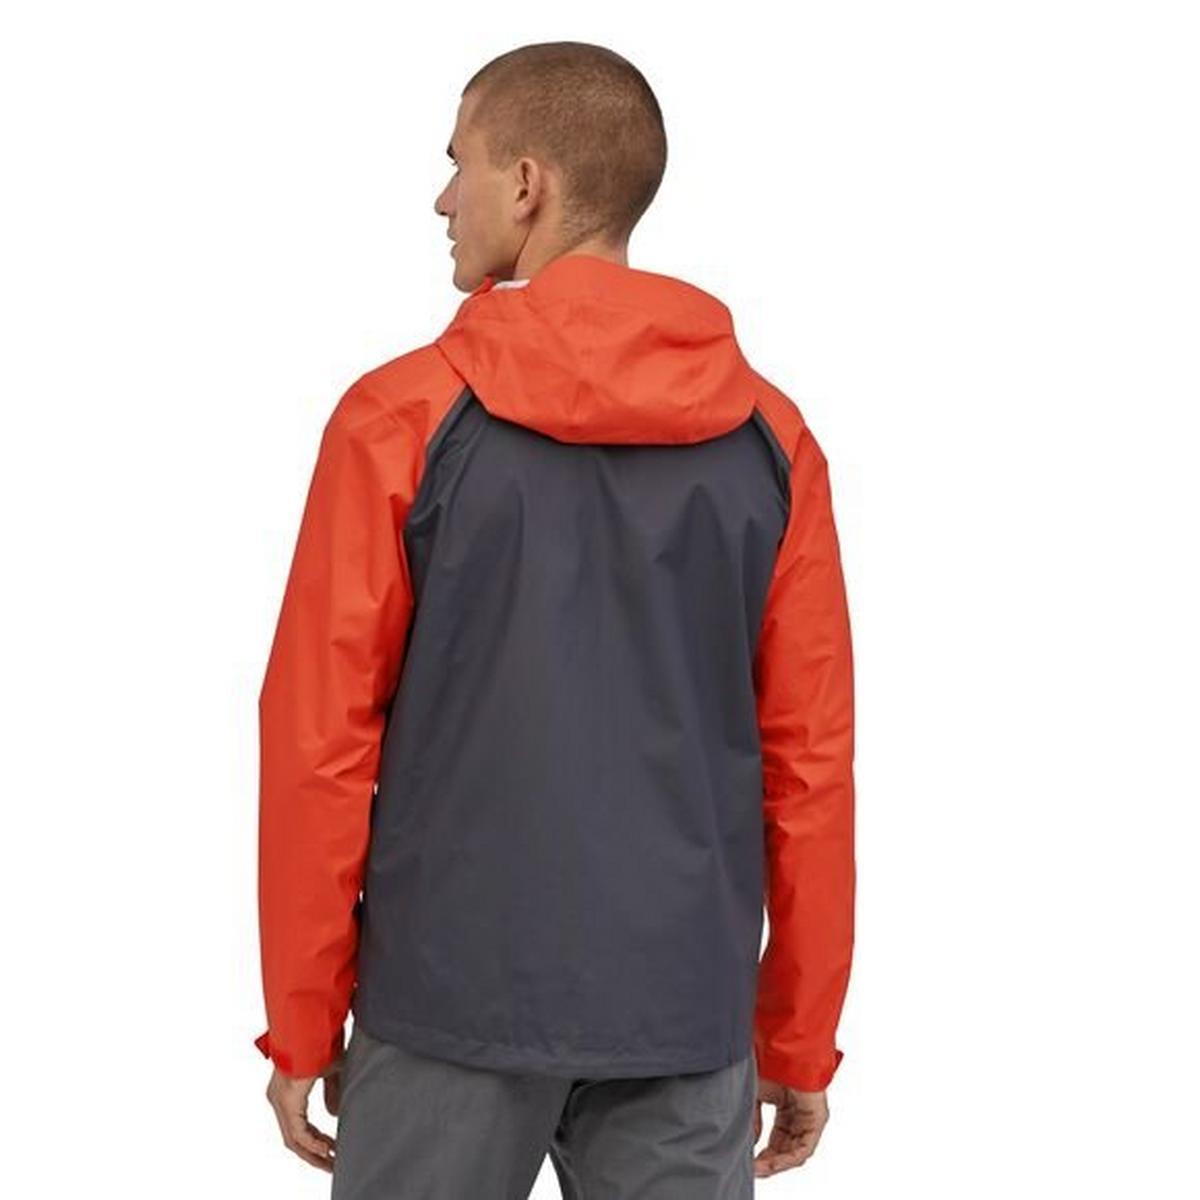 Patagonia Men's Torrentshell  3L Jacket - Hot Ember